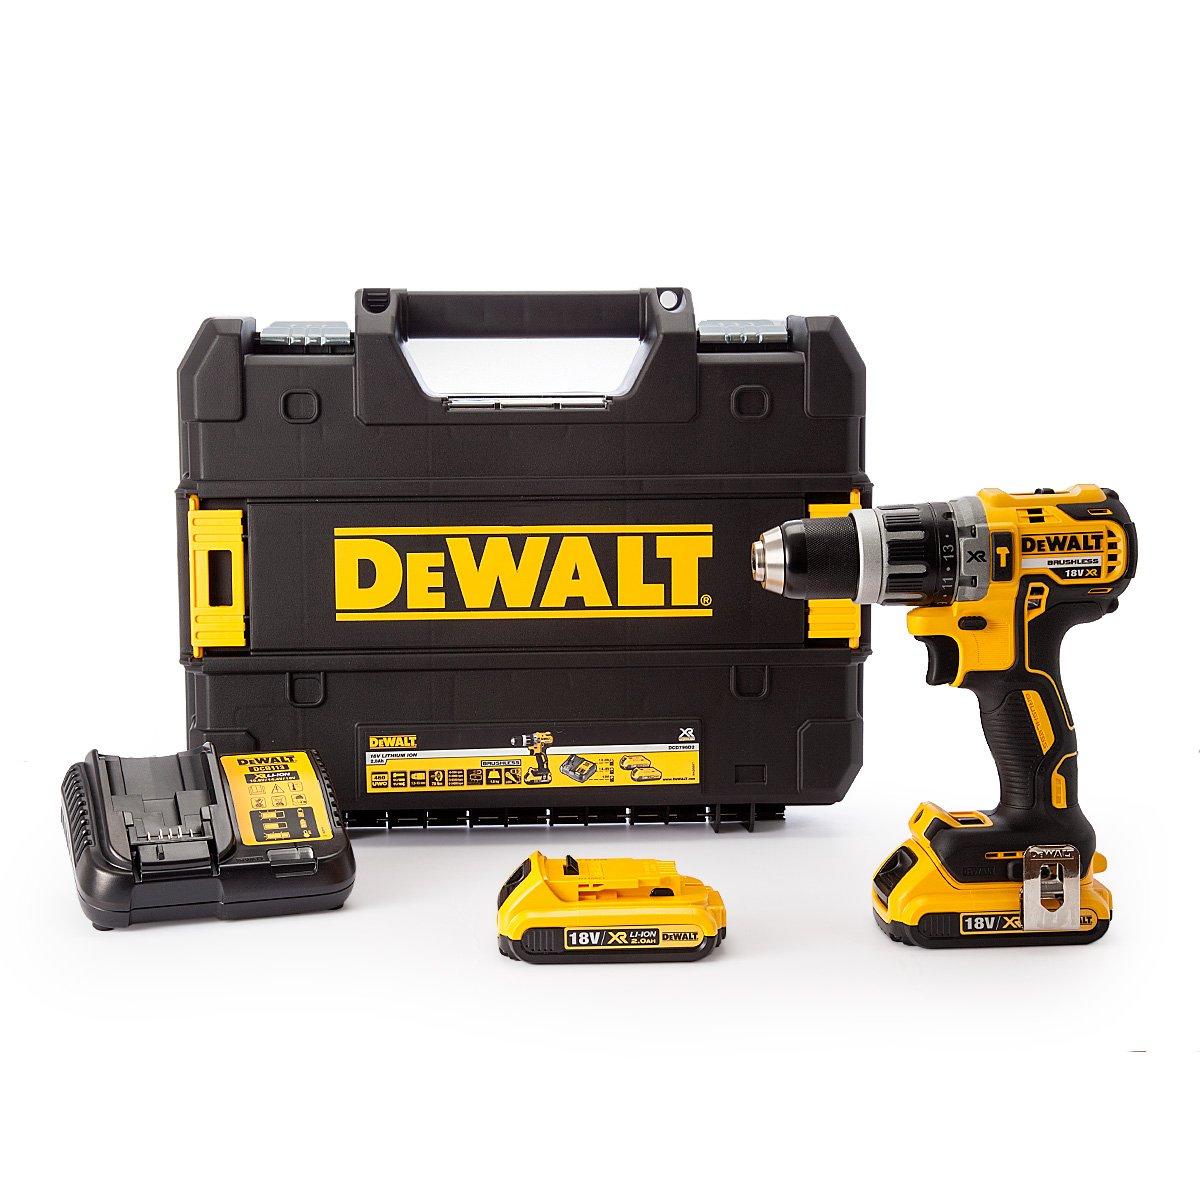 Dewalt DCD796P1 Combi Drill 18V XR Brushless Compact Li